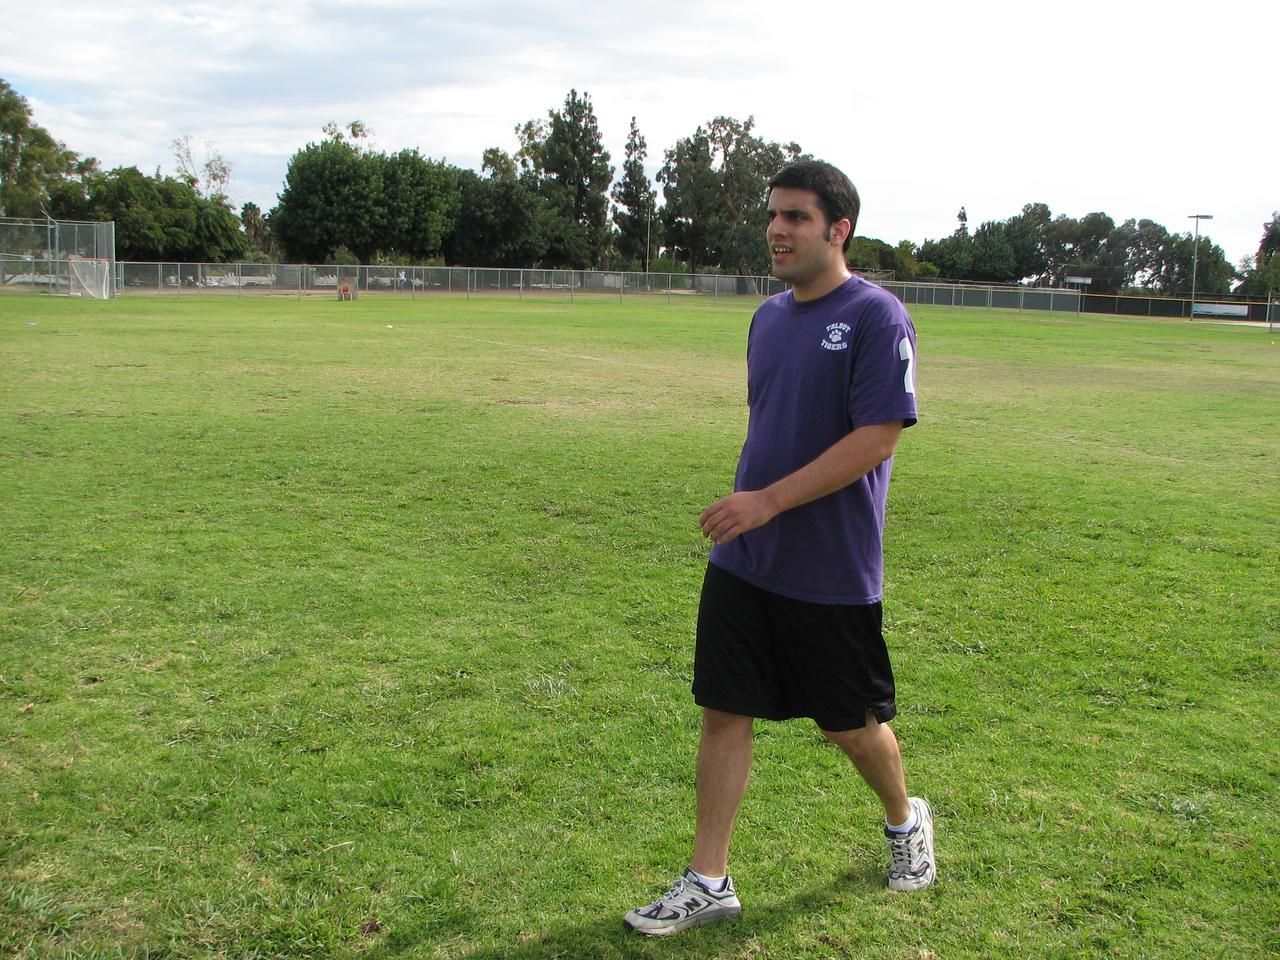 2006 10 13 Fri - Todd 'Alabama' struts the field